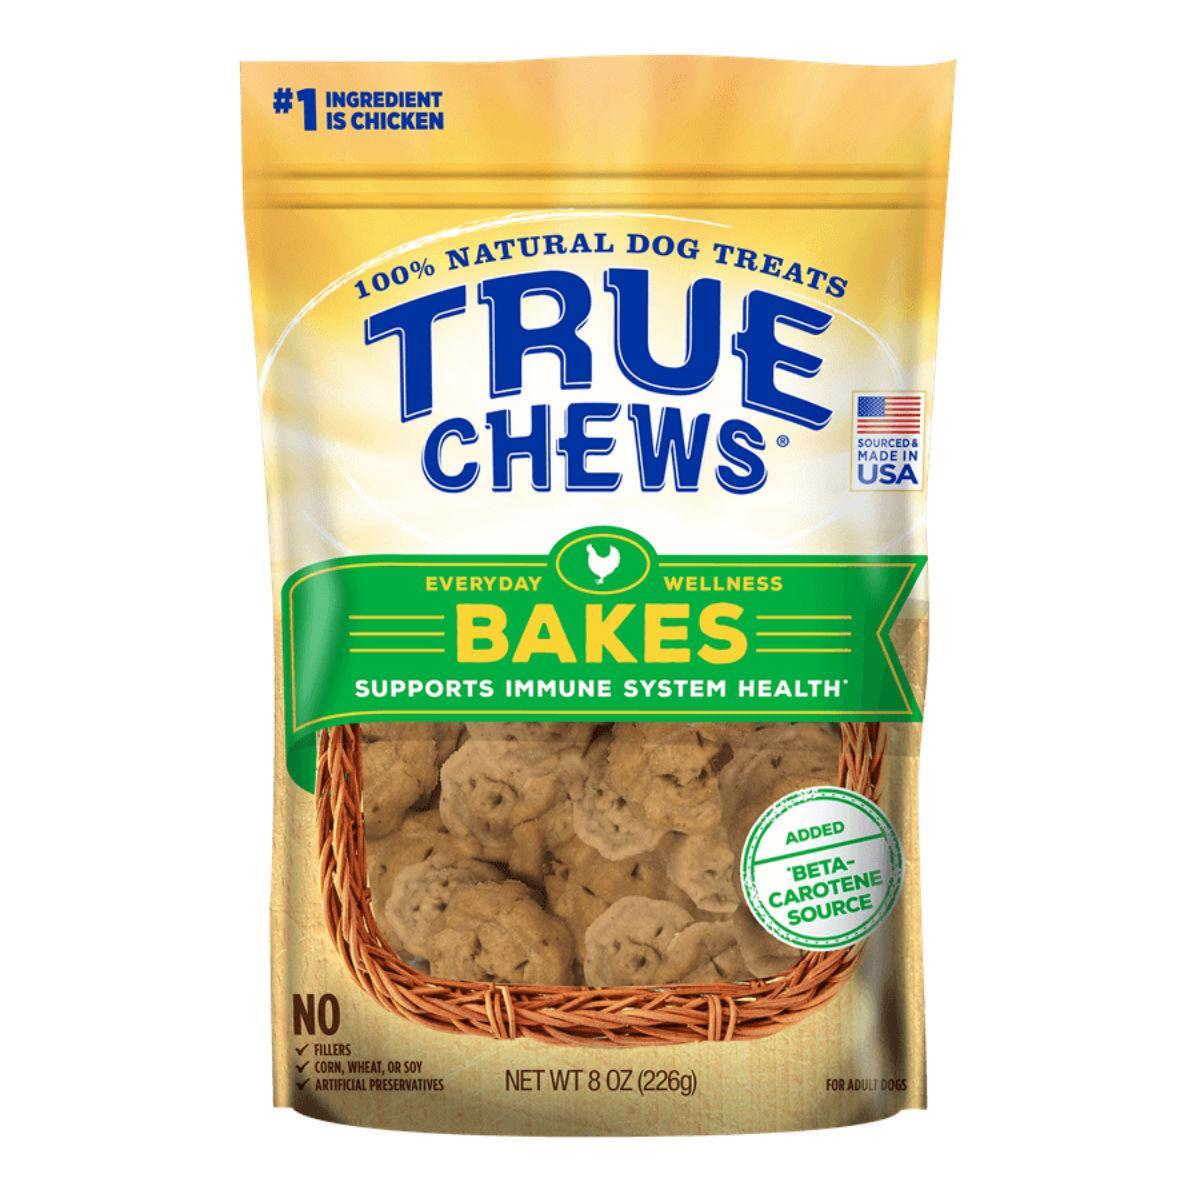 True Chews Everyday Wellness Bakes Dog Treat - Immune Health